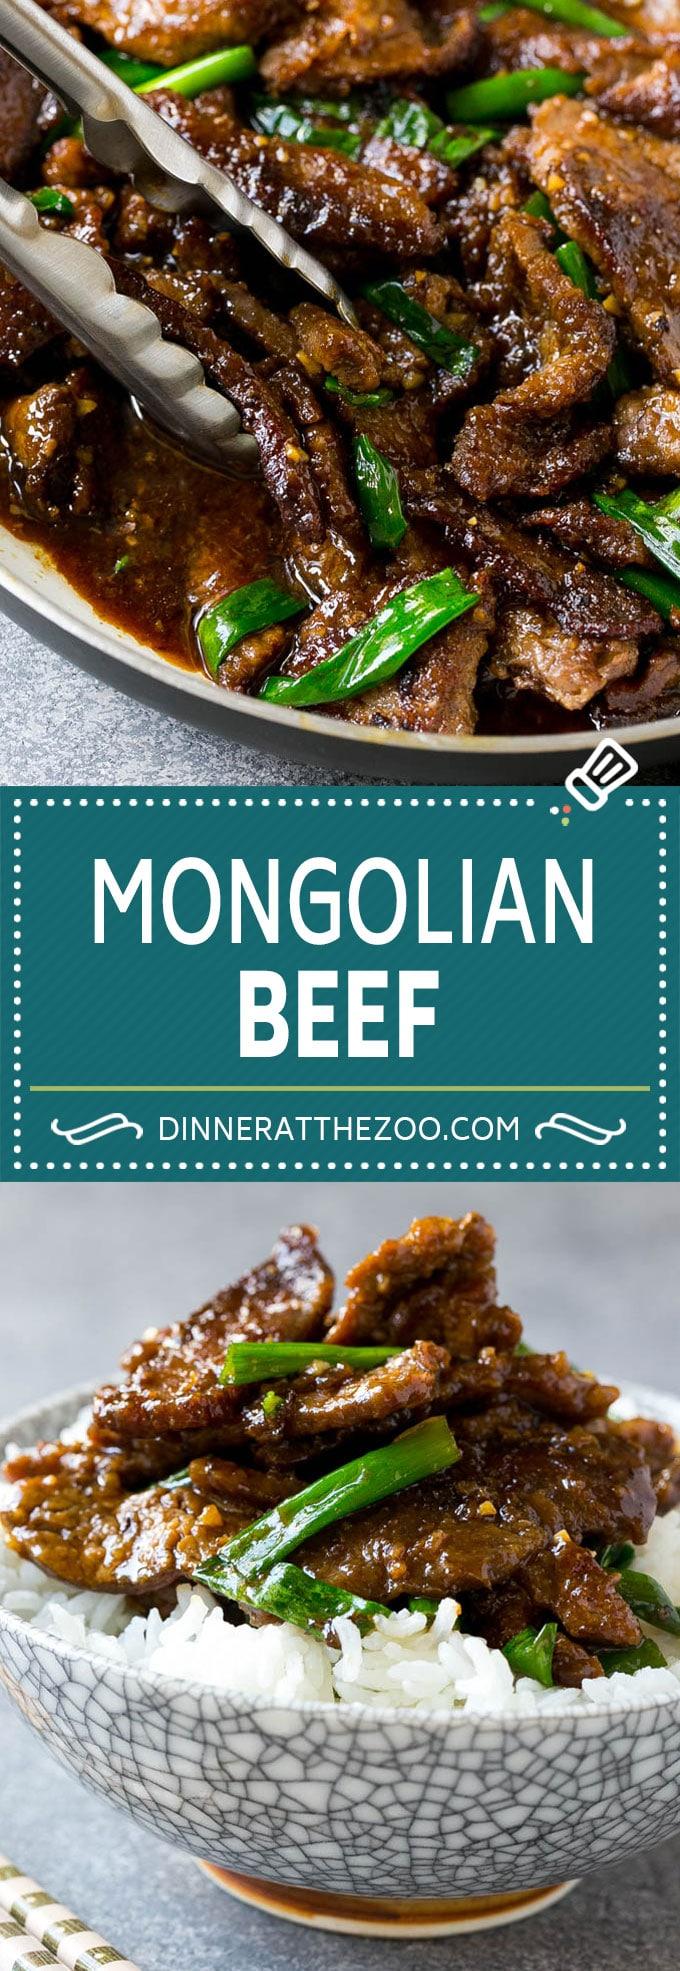 Mongolian Beef Recipe   Asian Beef Recipe   Beef Stir Fry #beef #chinesefood #stirfry #dinner #dinneratthezoo